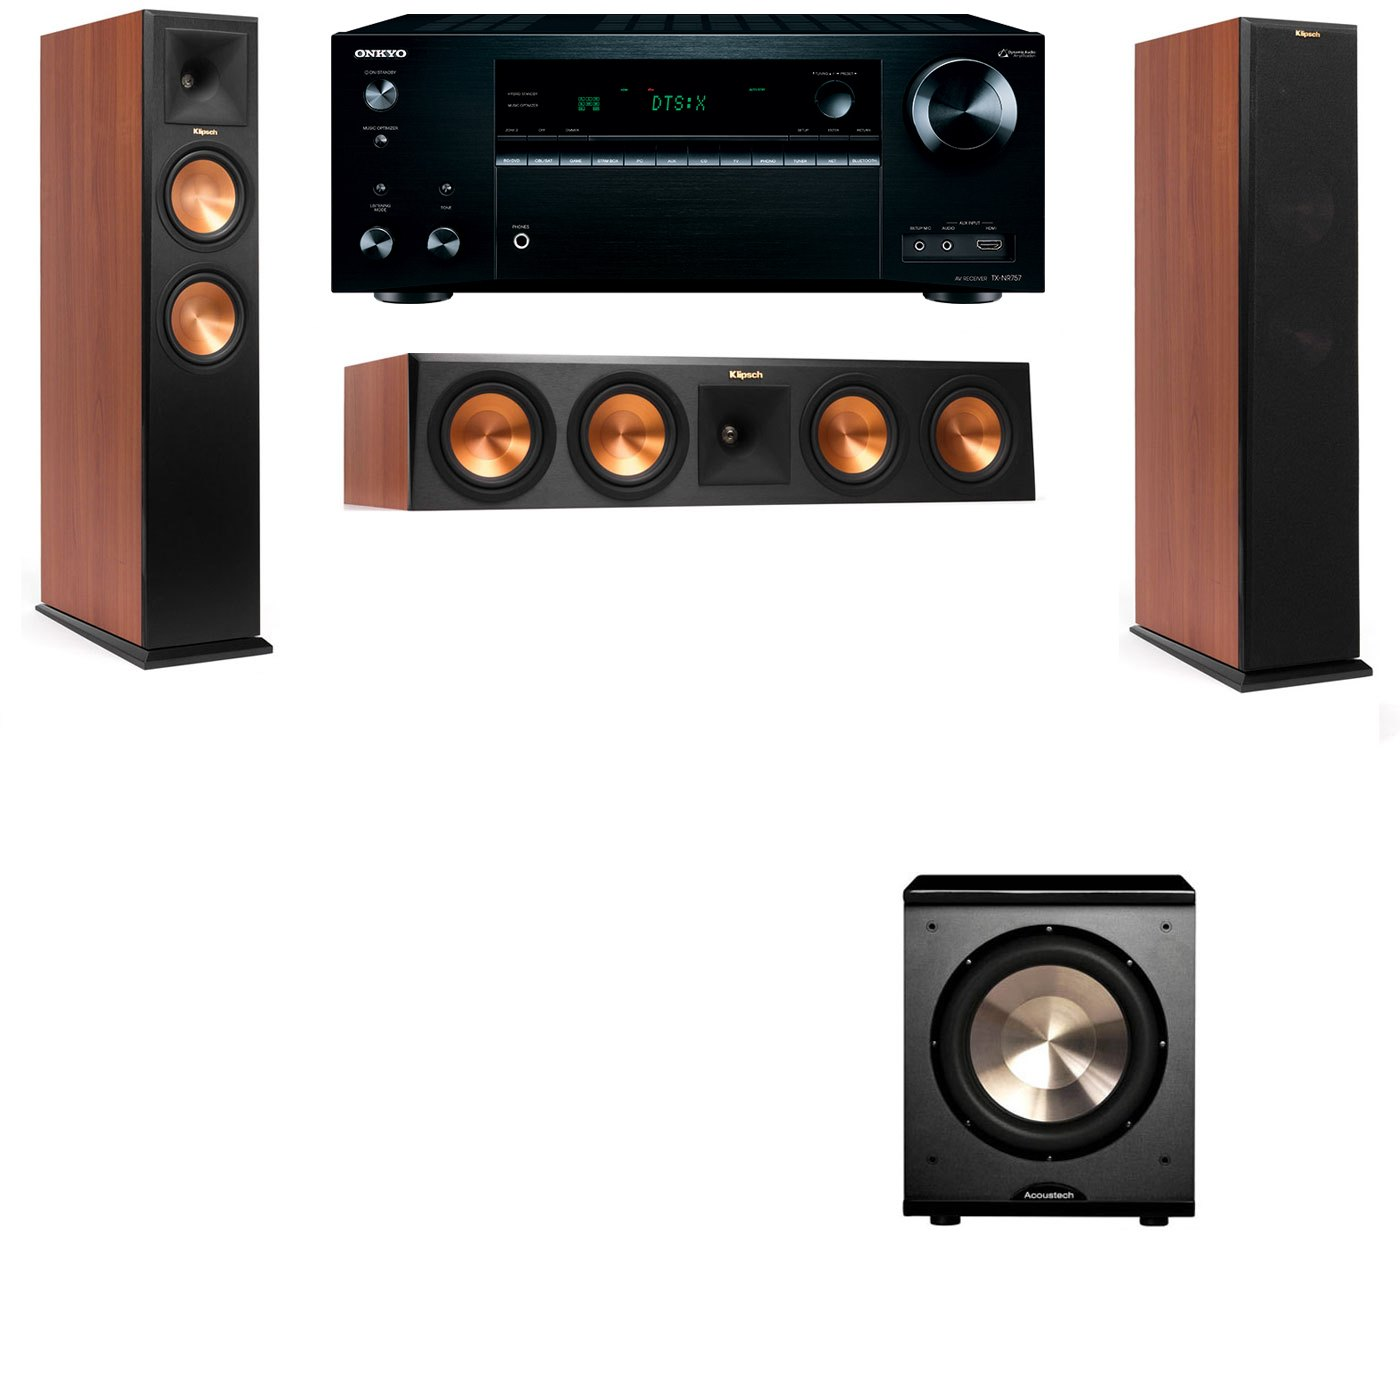 Klipsch RP-250F Tower Speakers CH-PL-200-3.1-Onkyo TX-NR757